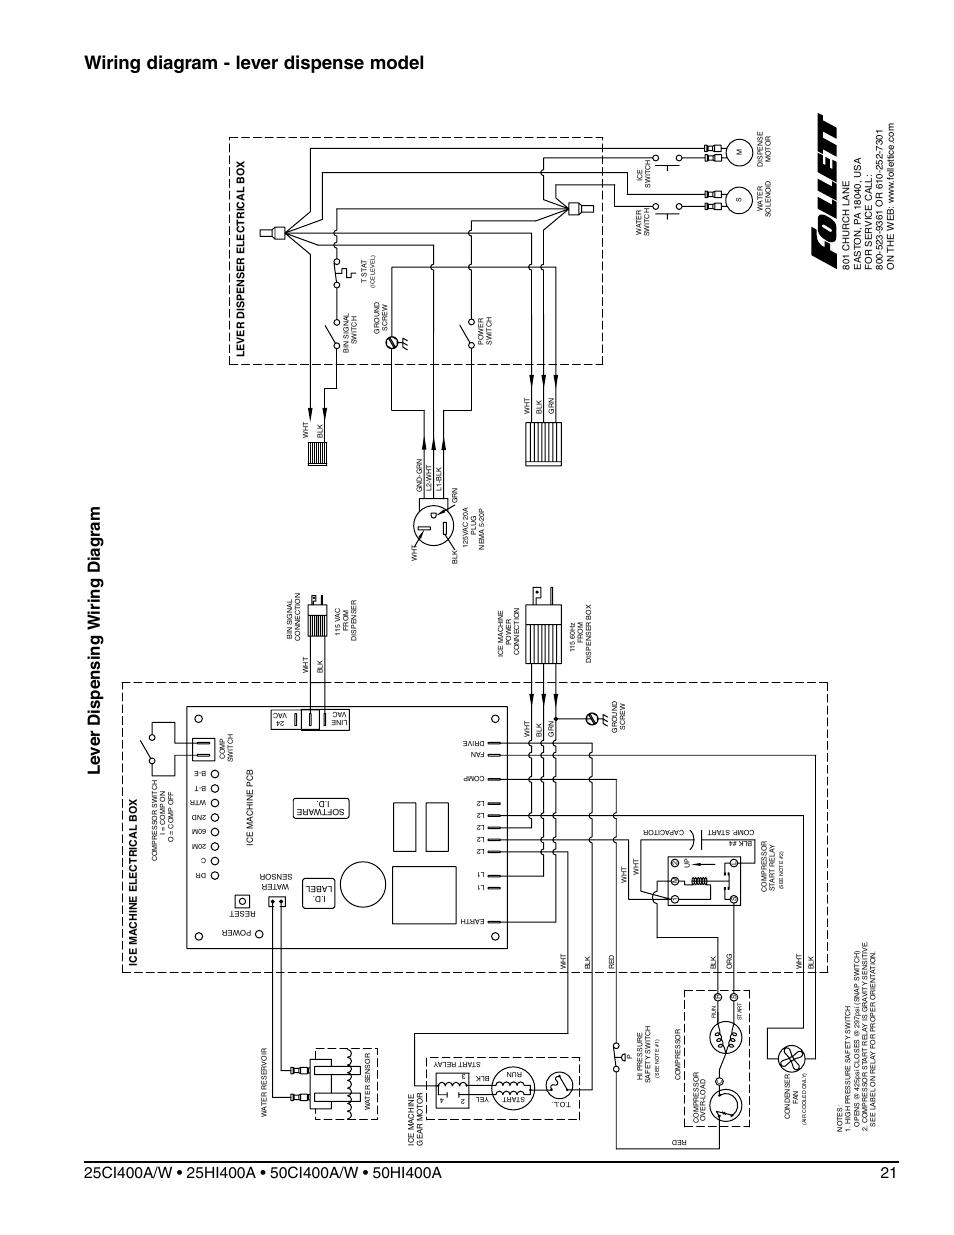 Wiring diagram - lever dispense model, Ice machine electrical bo x |  Follett Symphony 50HI400A